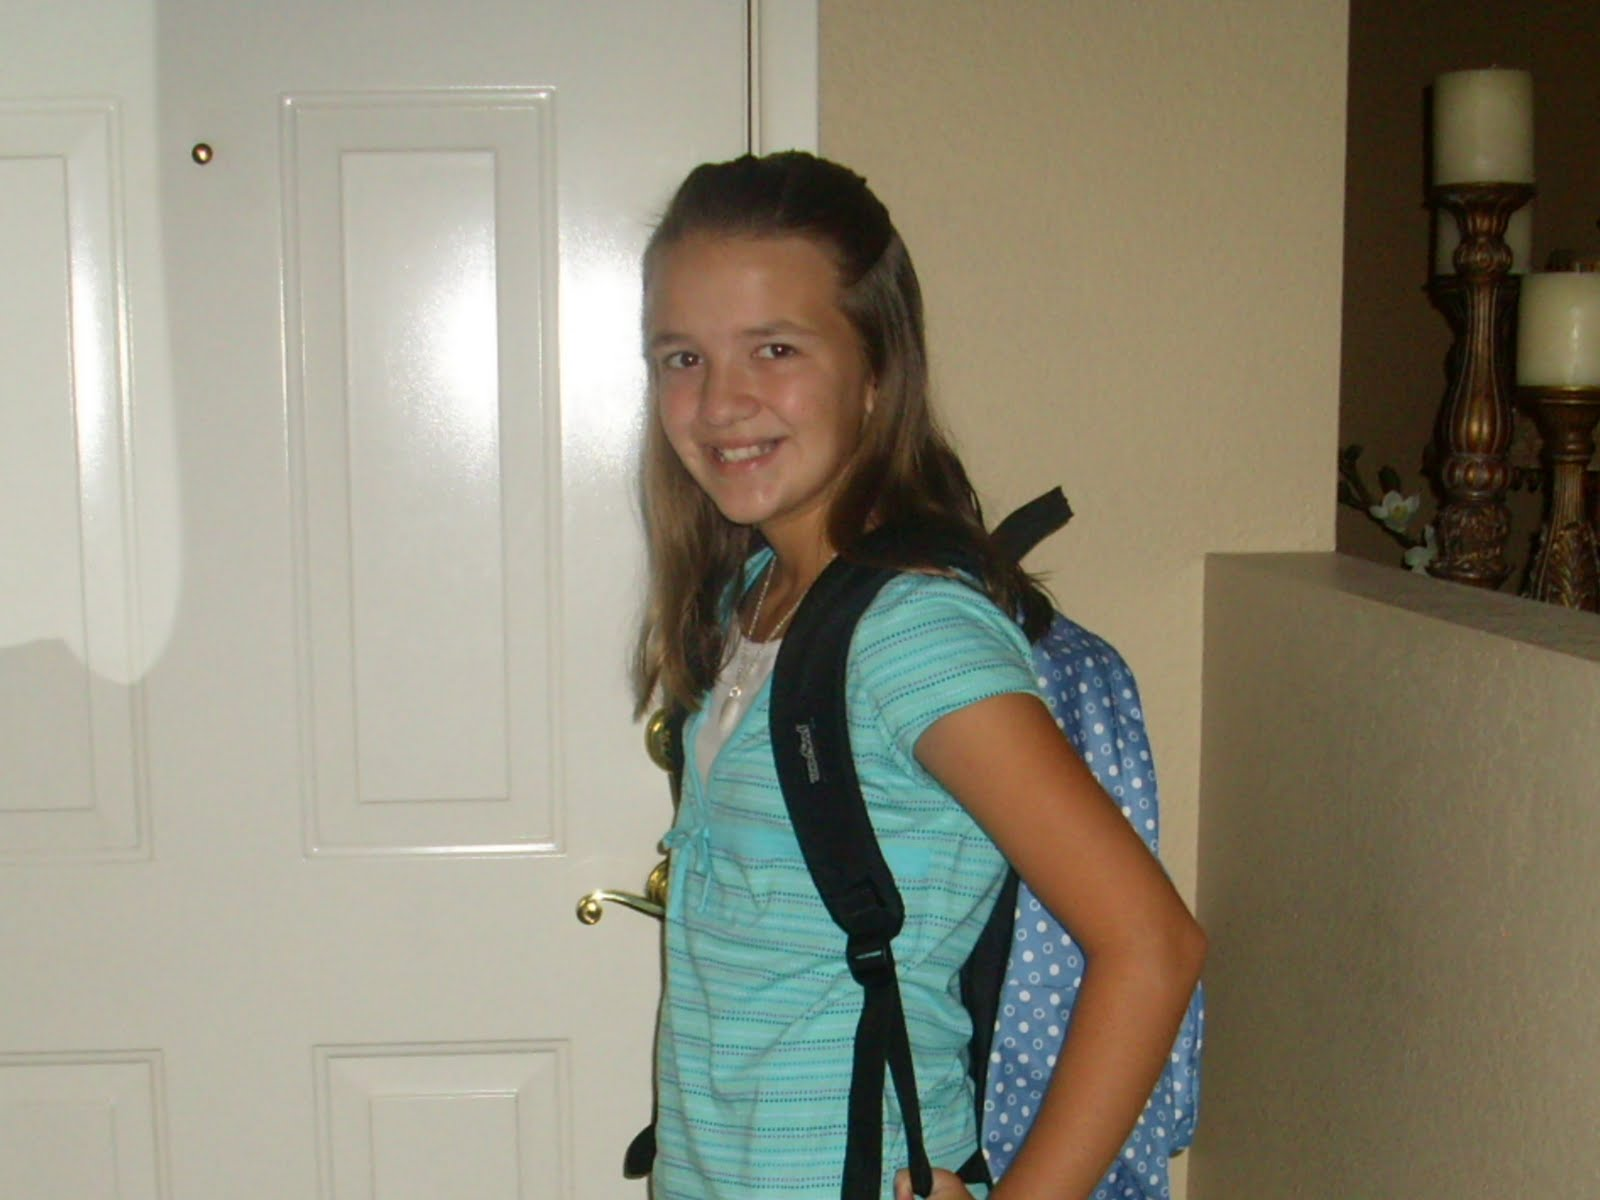 7th grade girl dating 6th grade boy